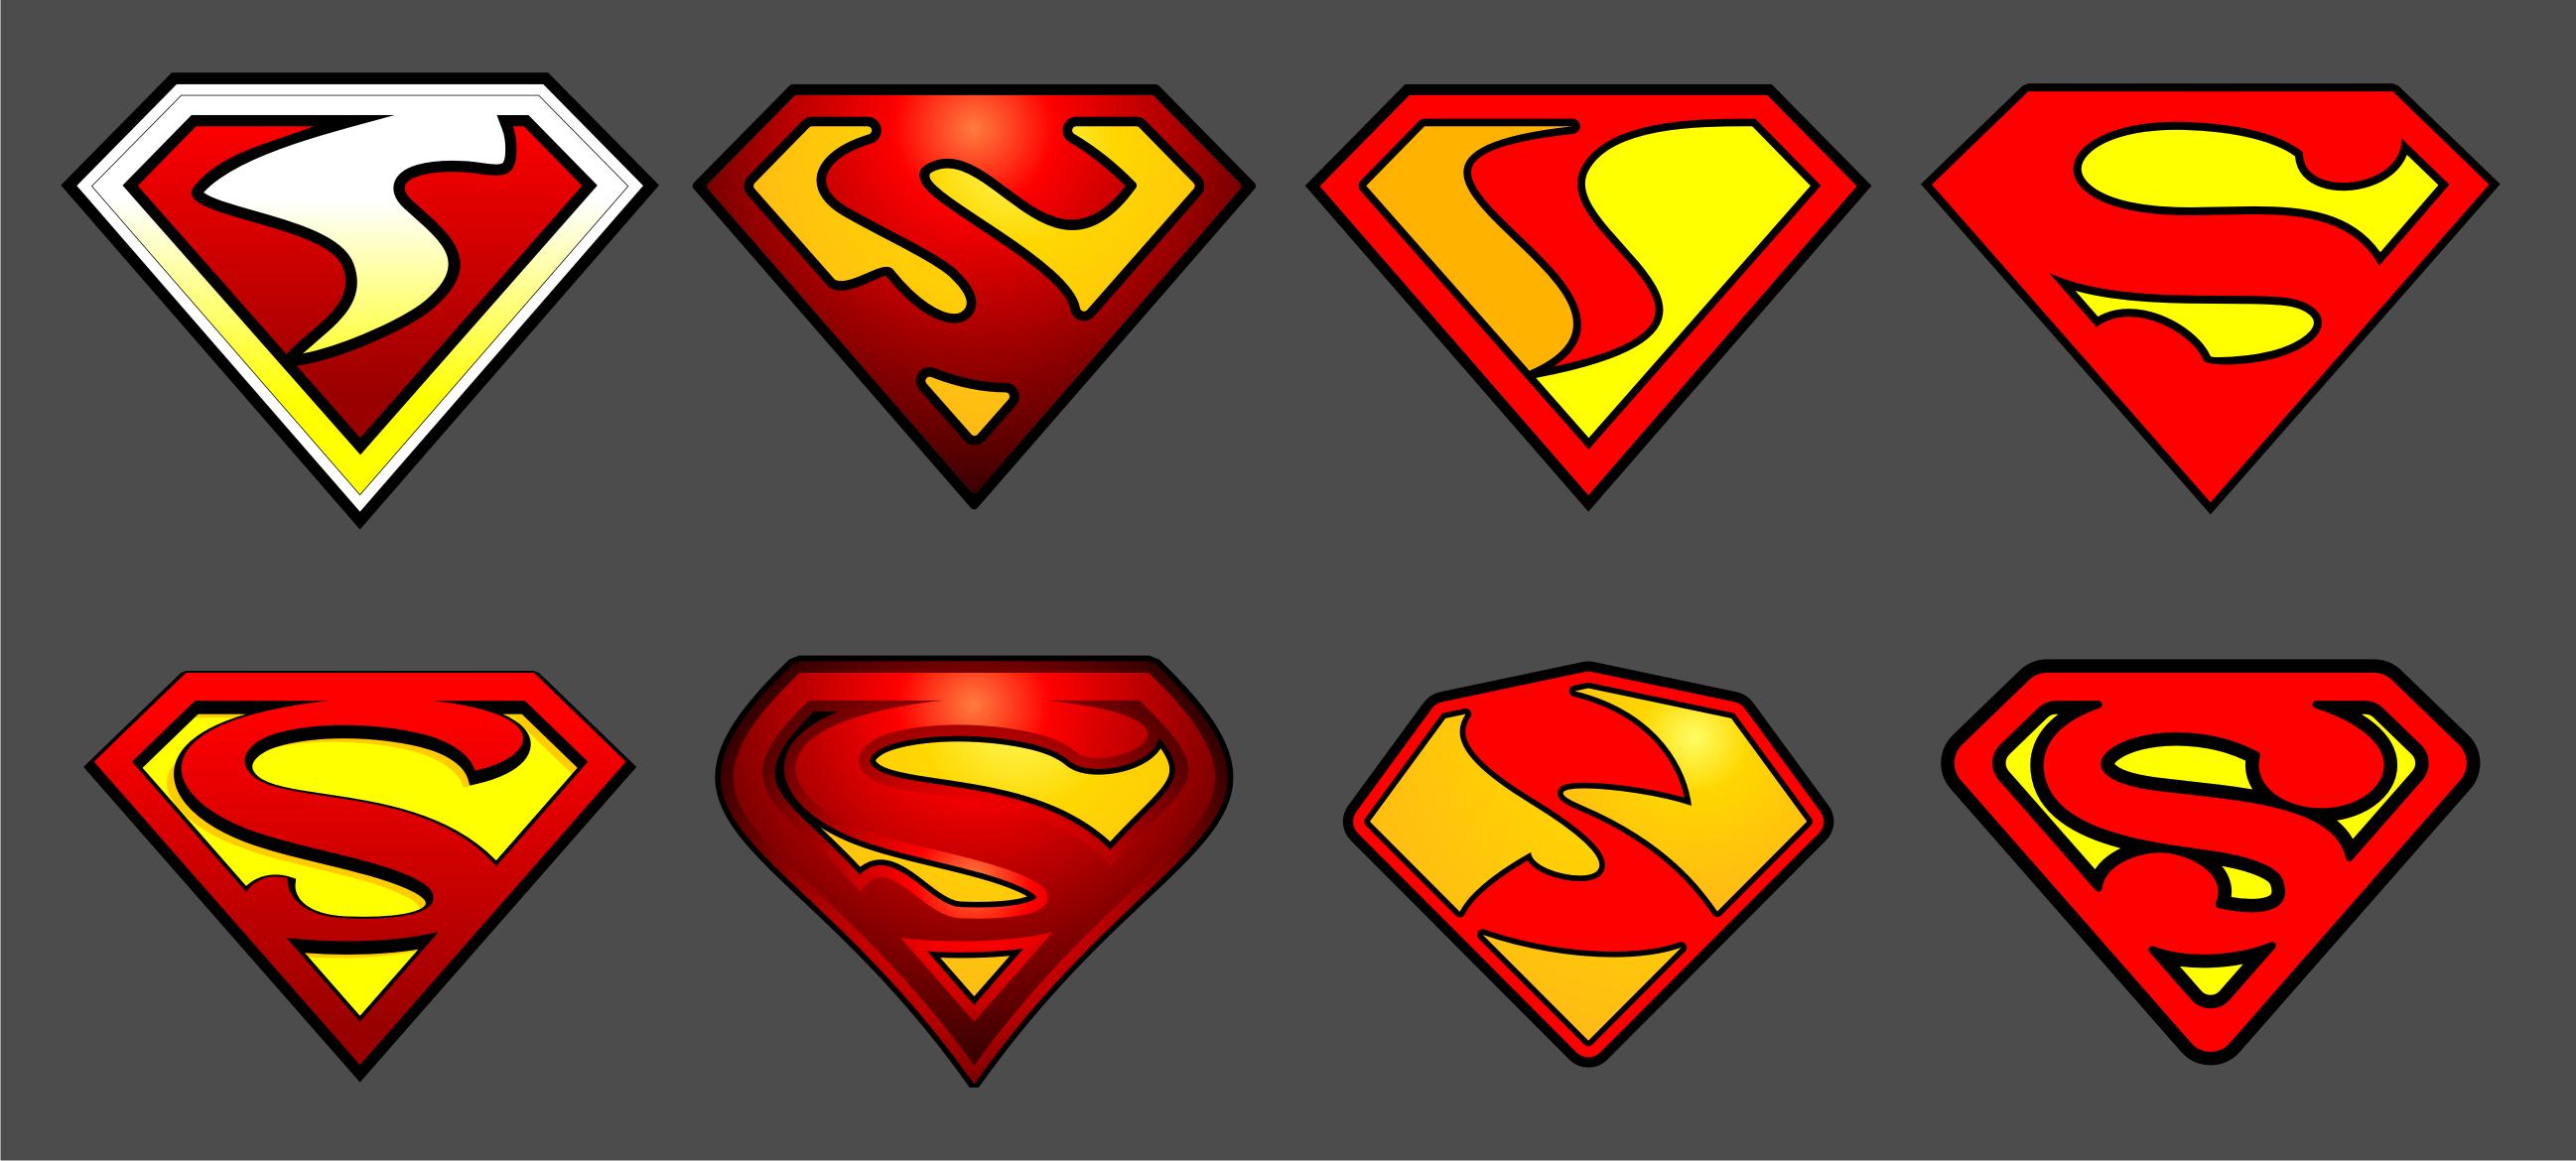 500 superman logo  wallpapers  hd images  vectors free printable superman logo black and white printable superman logo pdf